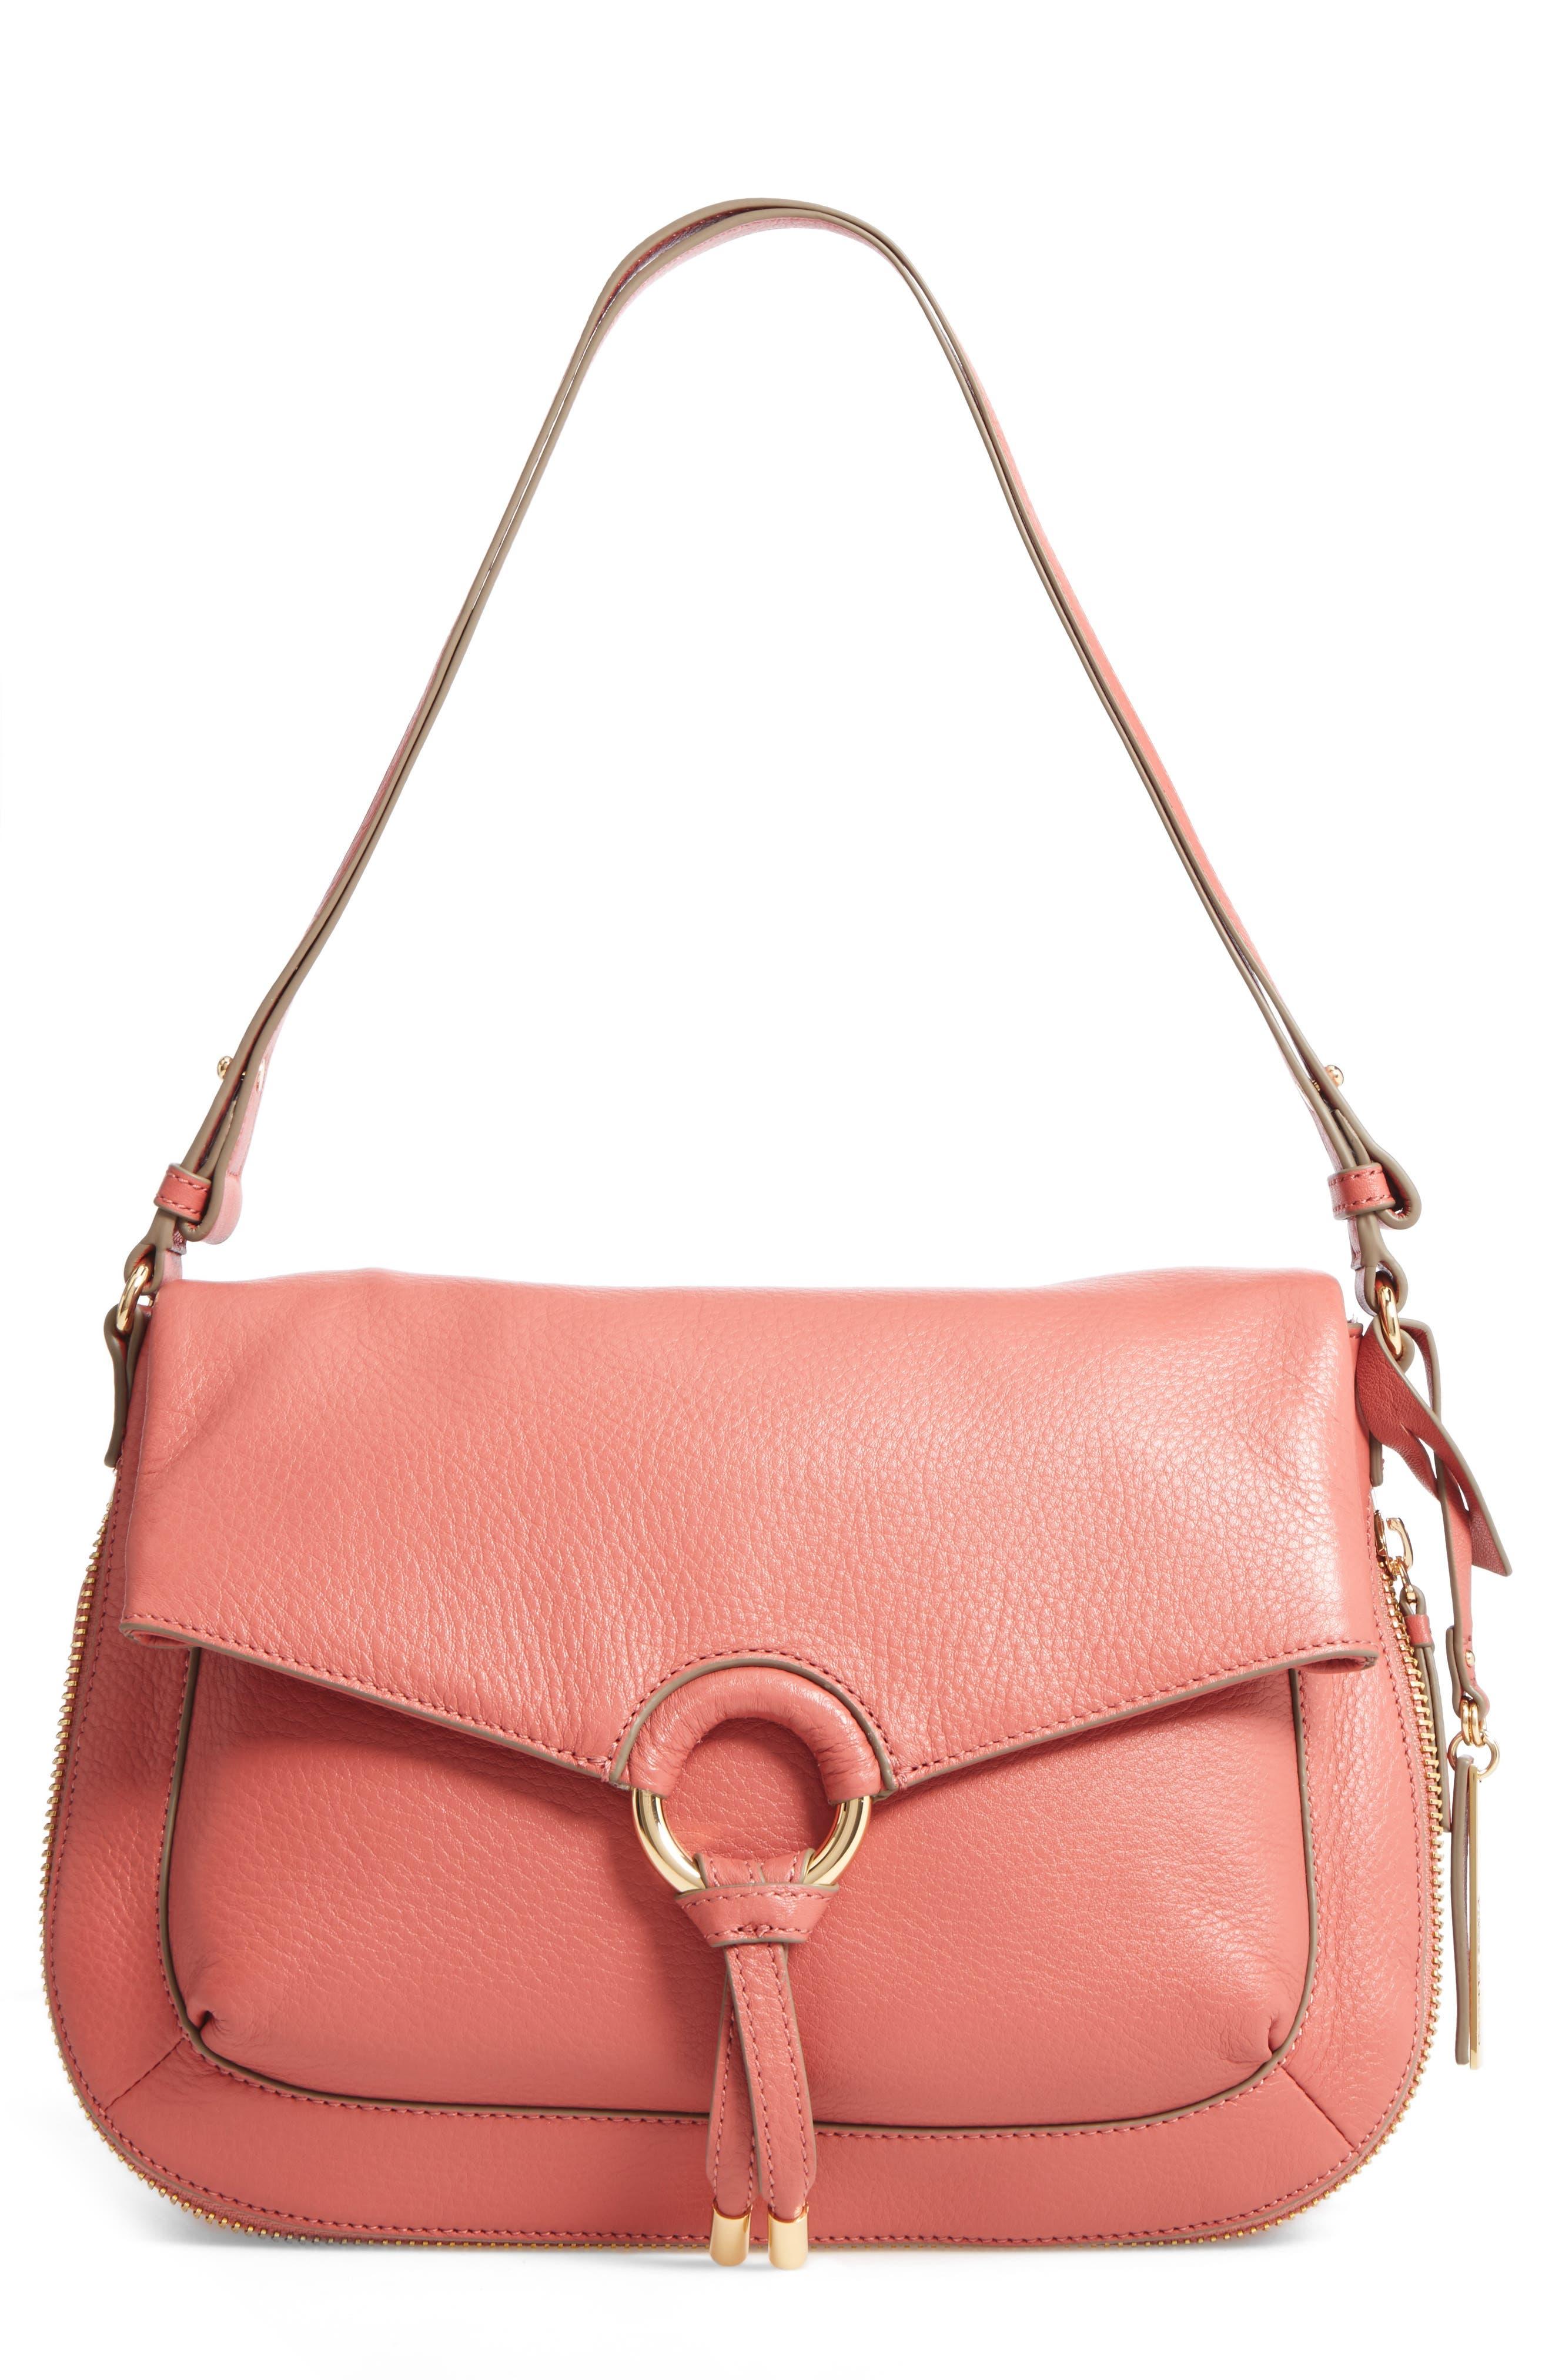 Vince Camuto Adina Leather Shoulder/Crossbody Bag